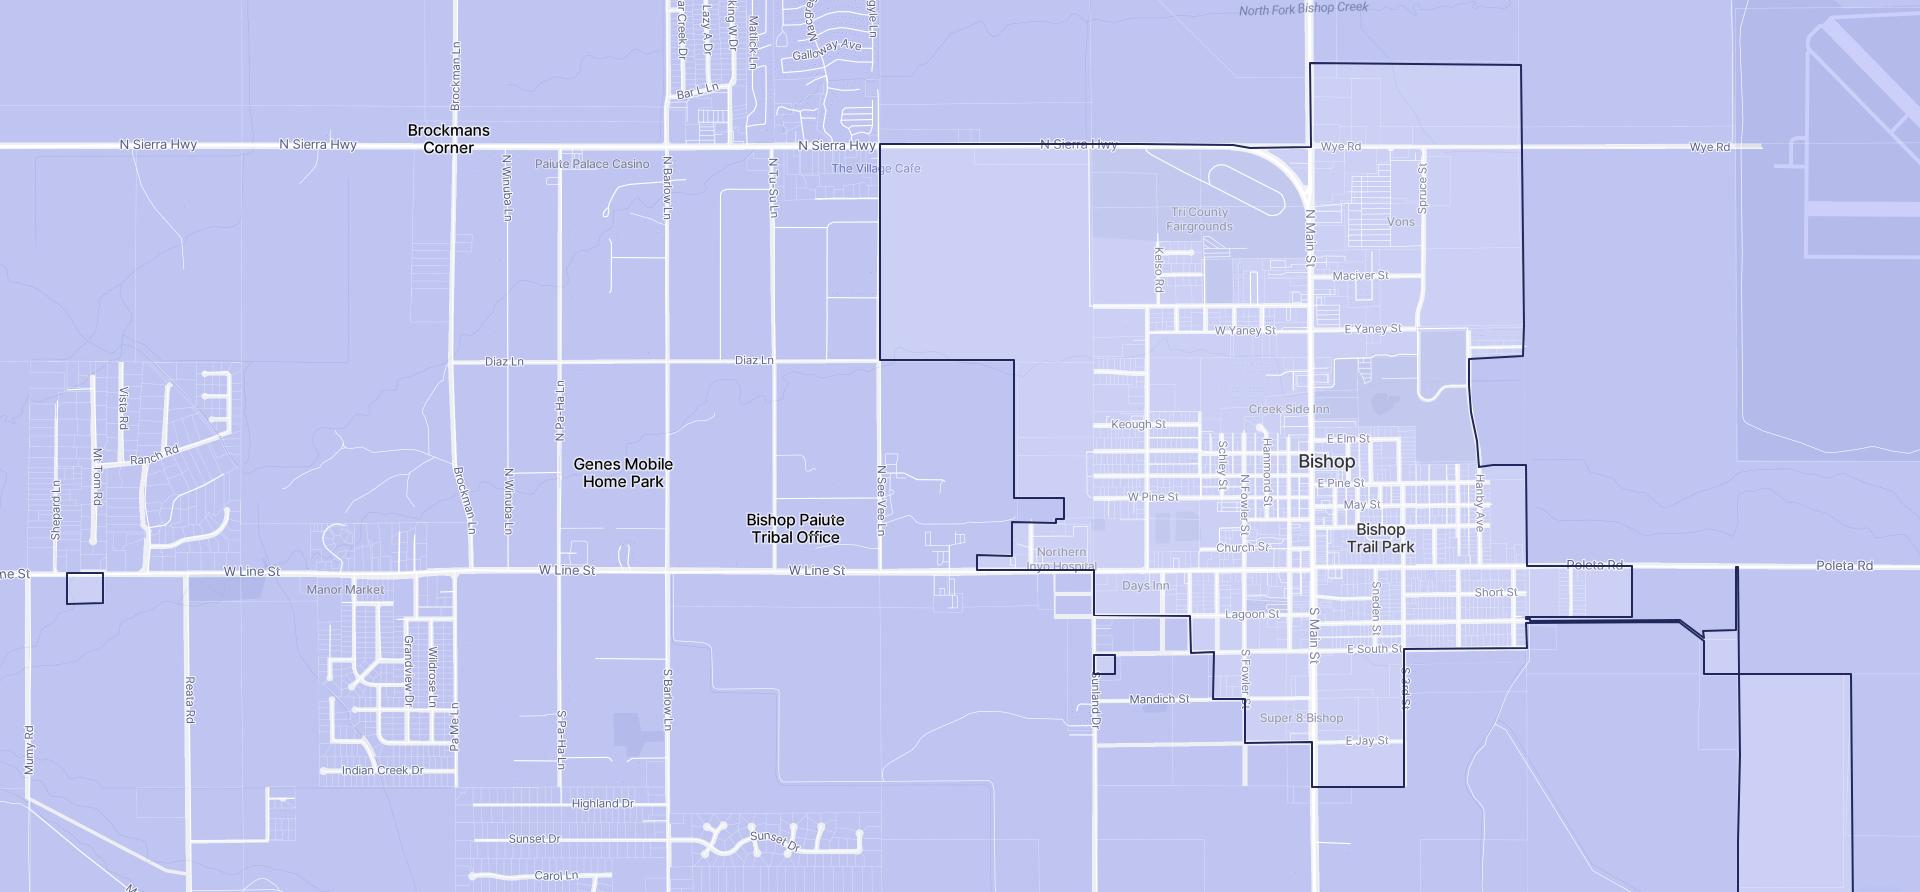 Image of Bishop boundaries on a map.